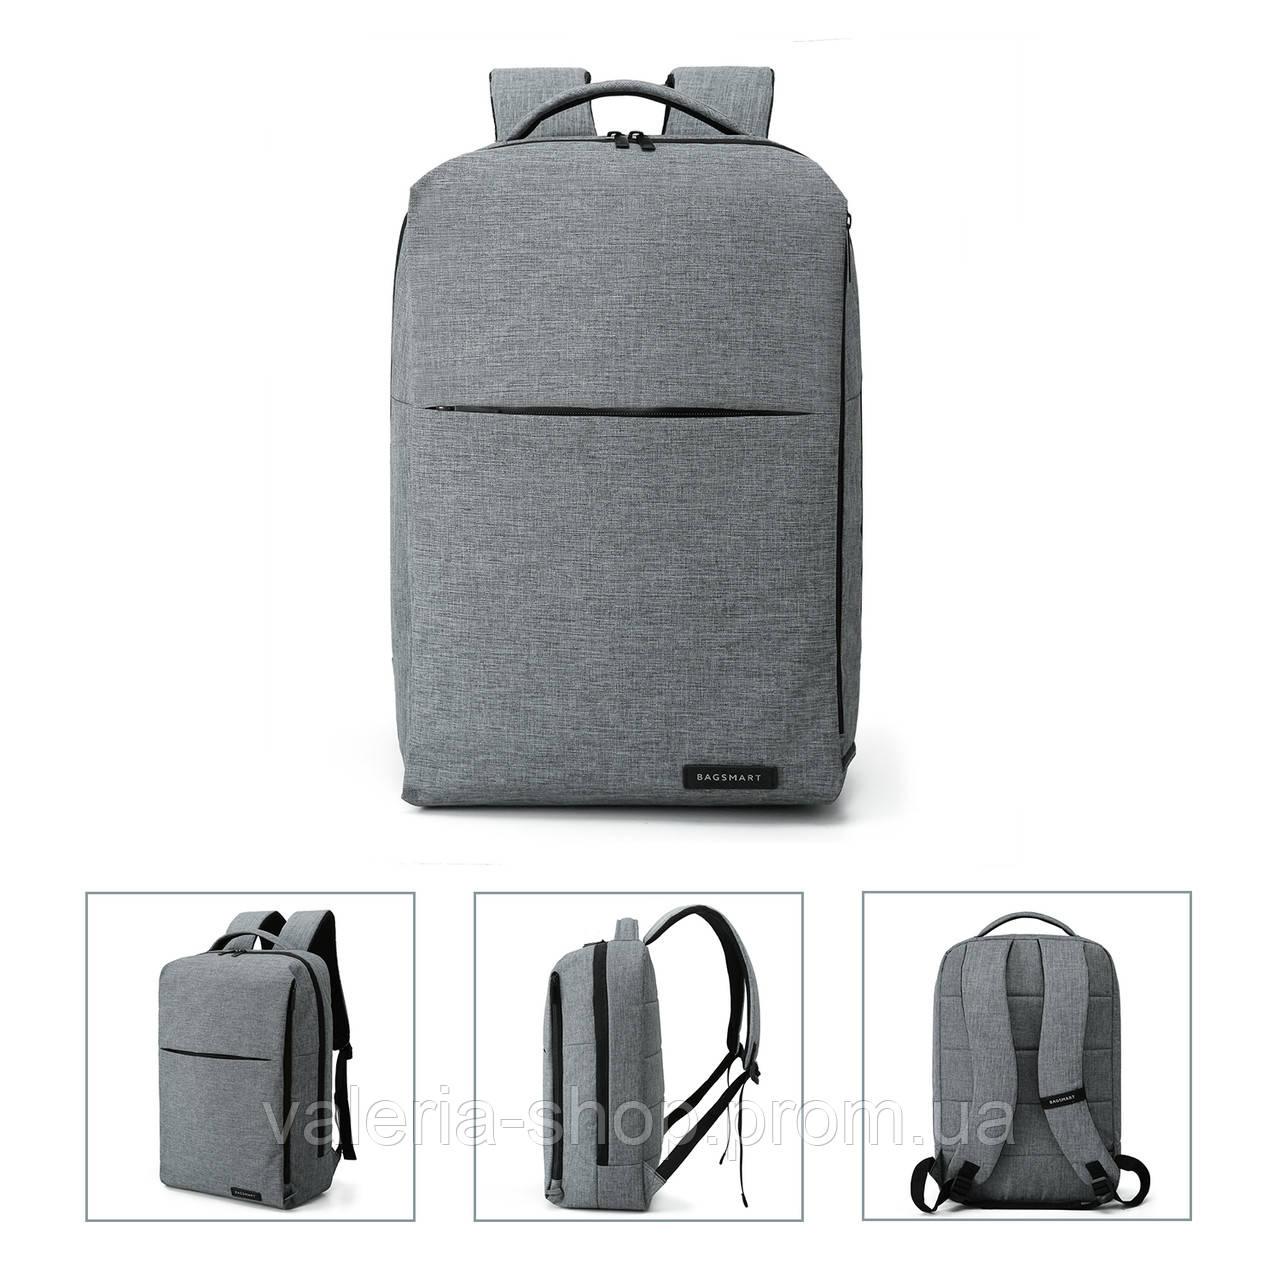 Рюкзак для ноутбука серый BAGSMART